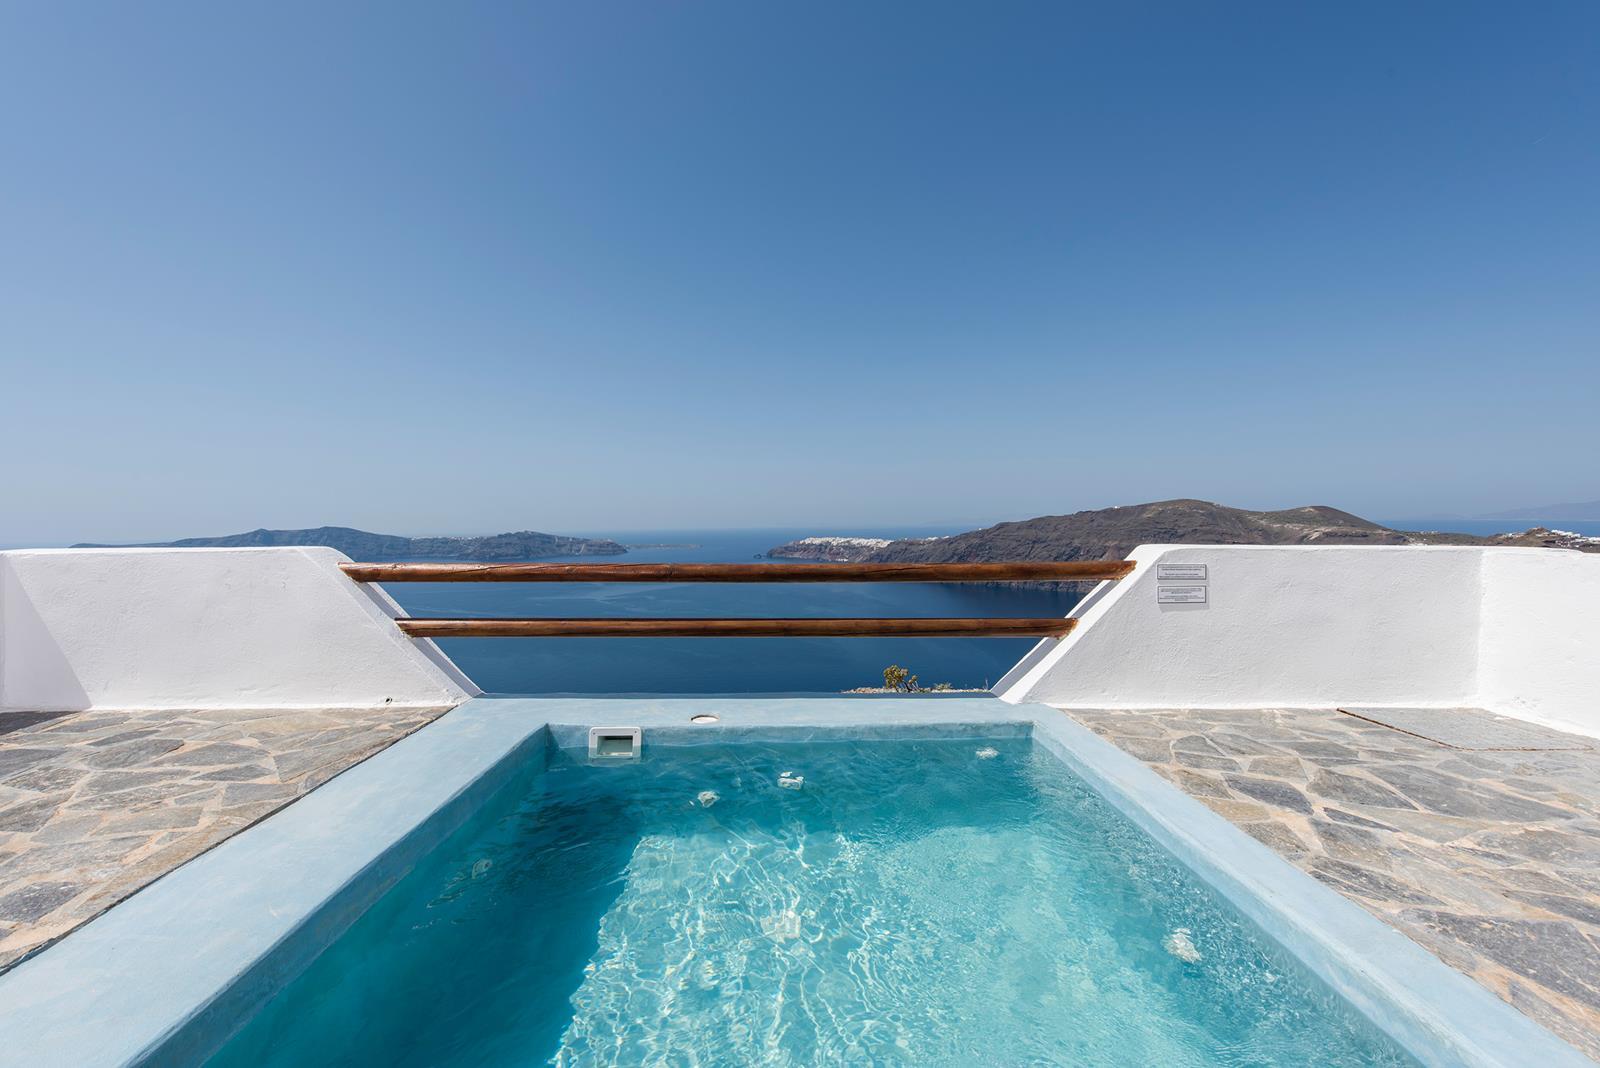 suites santorini - Gizis Exclusive Santorini Greece